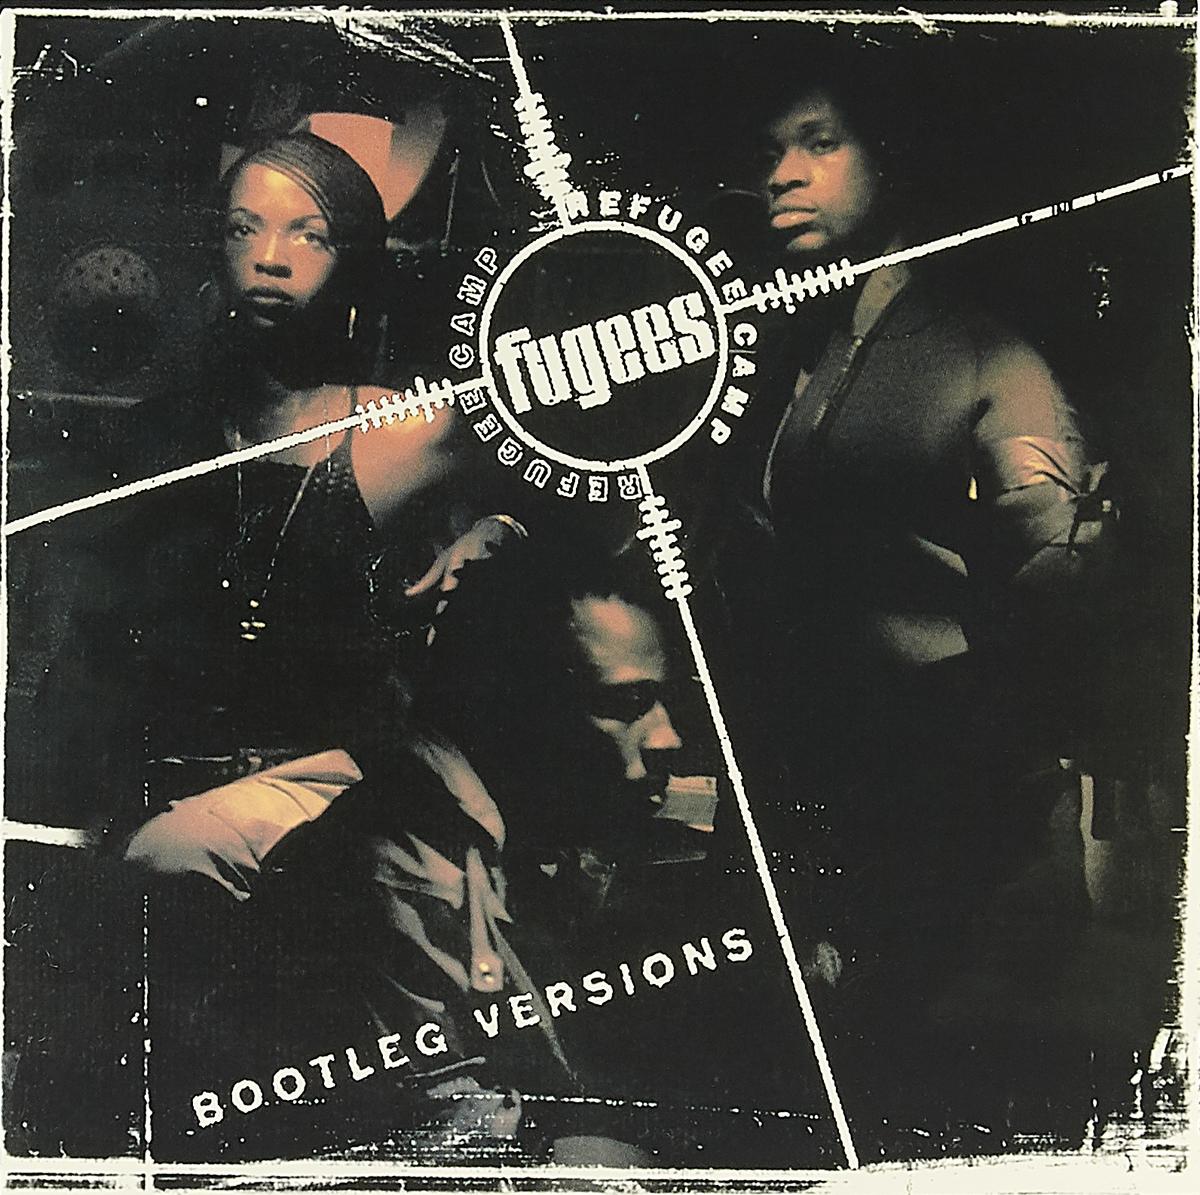 The Fugees Fugees. Refugee Camp (Bootleg Versions) (LP) цена